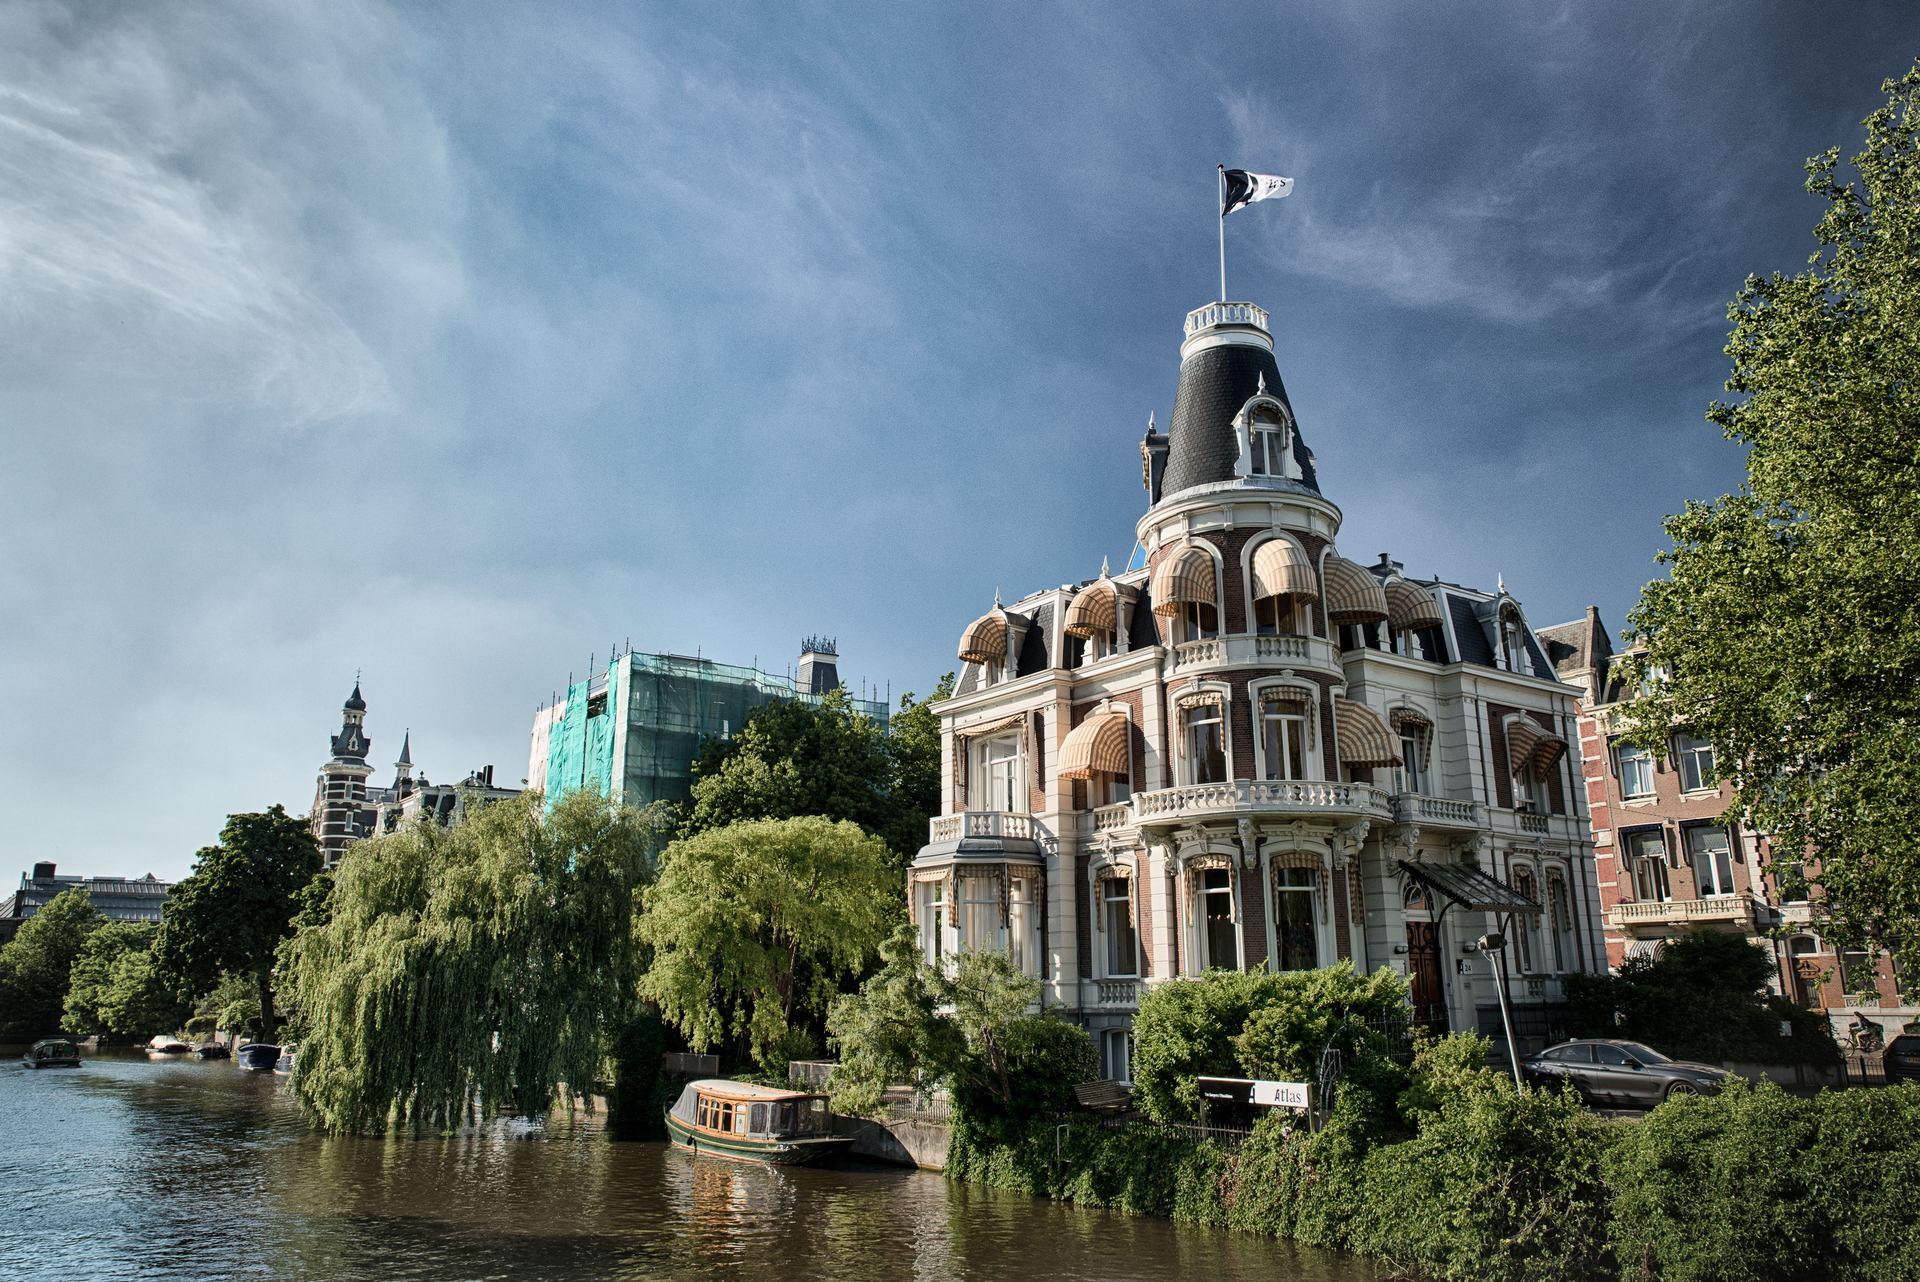 stories/2017-06-17-summer-in-amsterdam